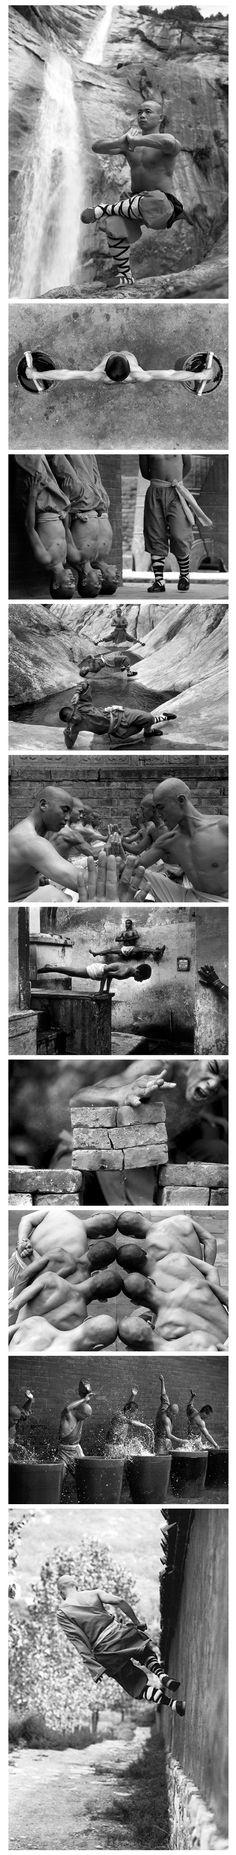 Shaolin Monks, mind over matter